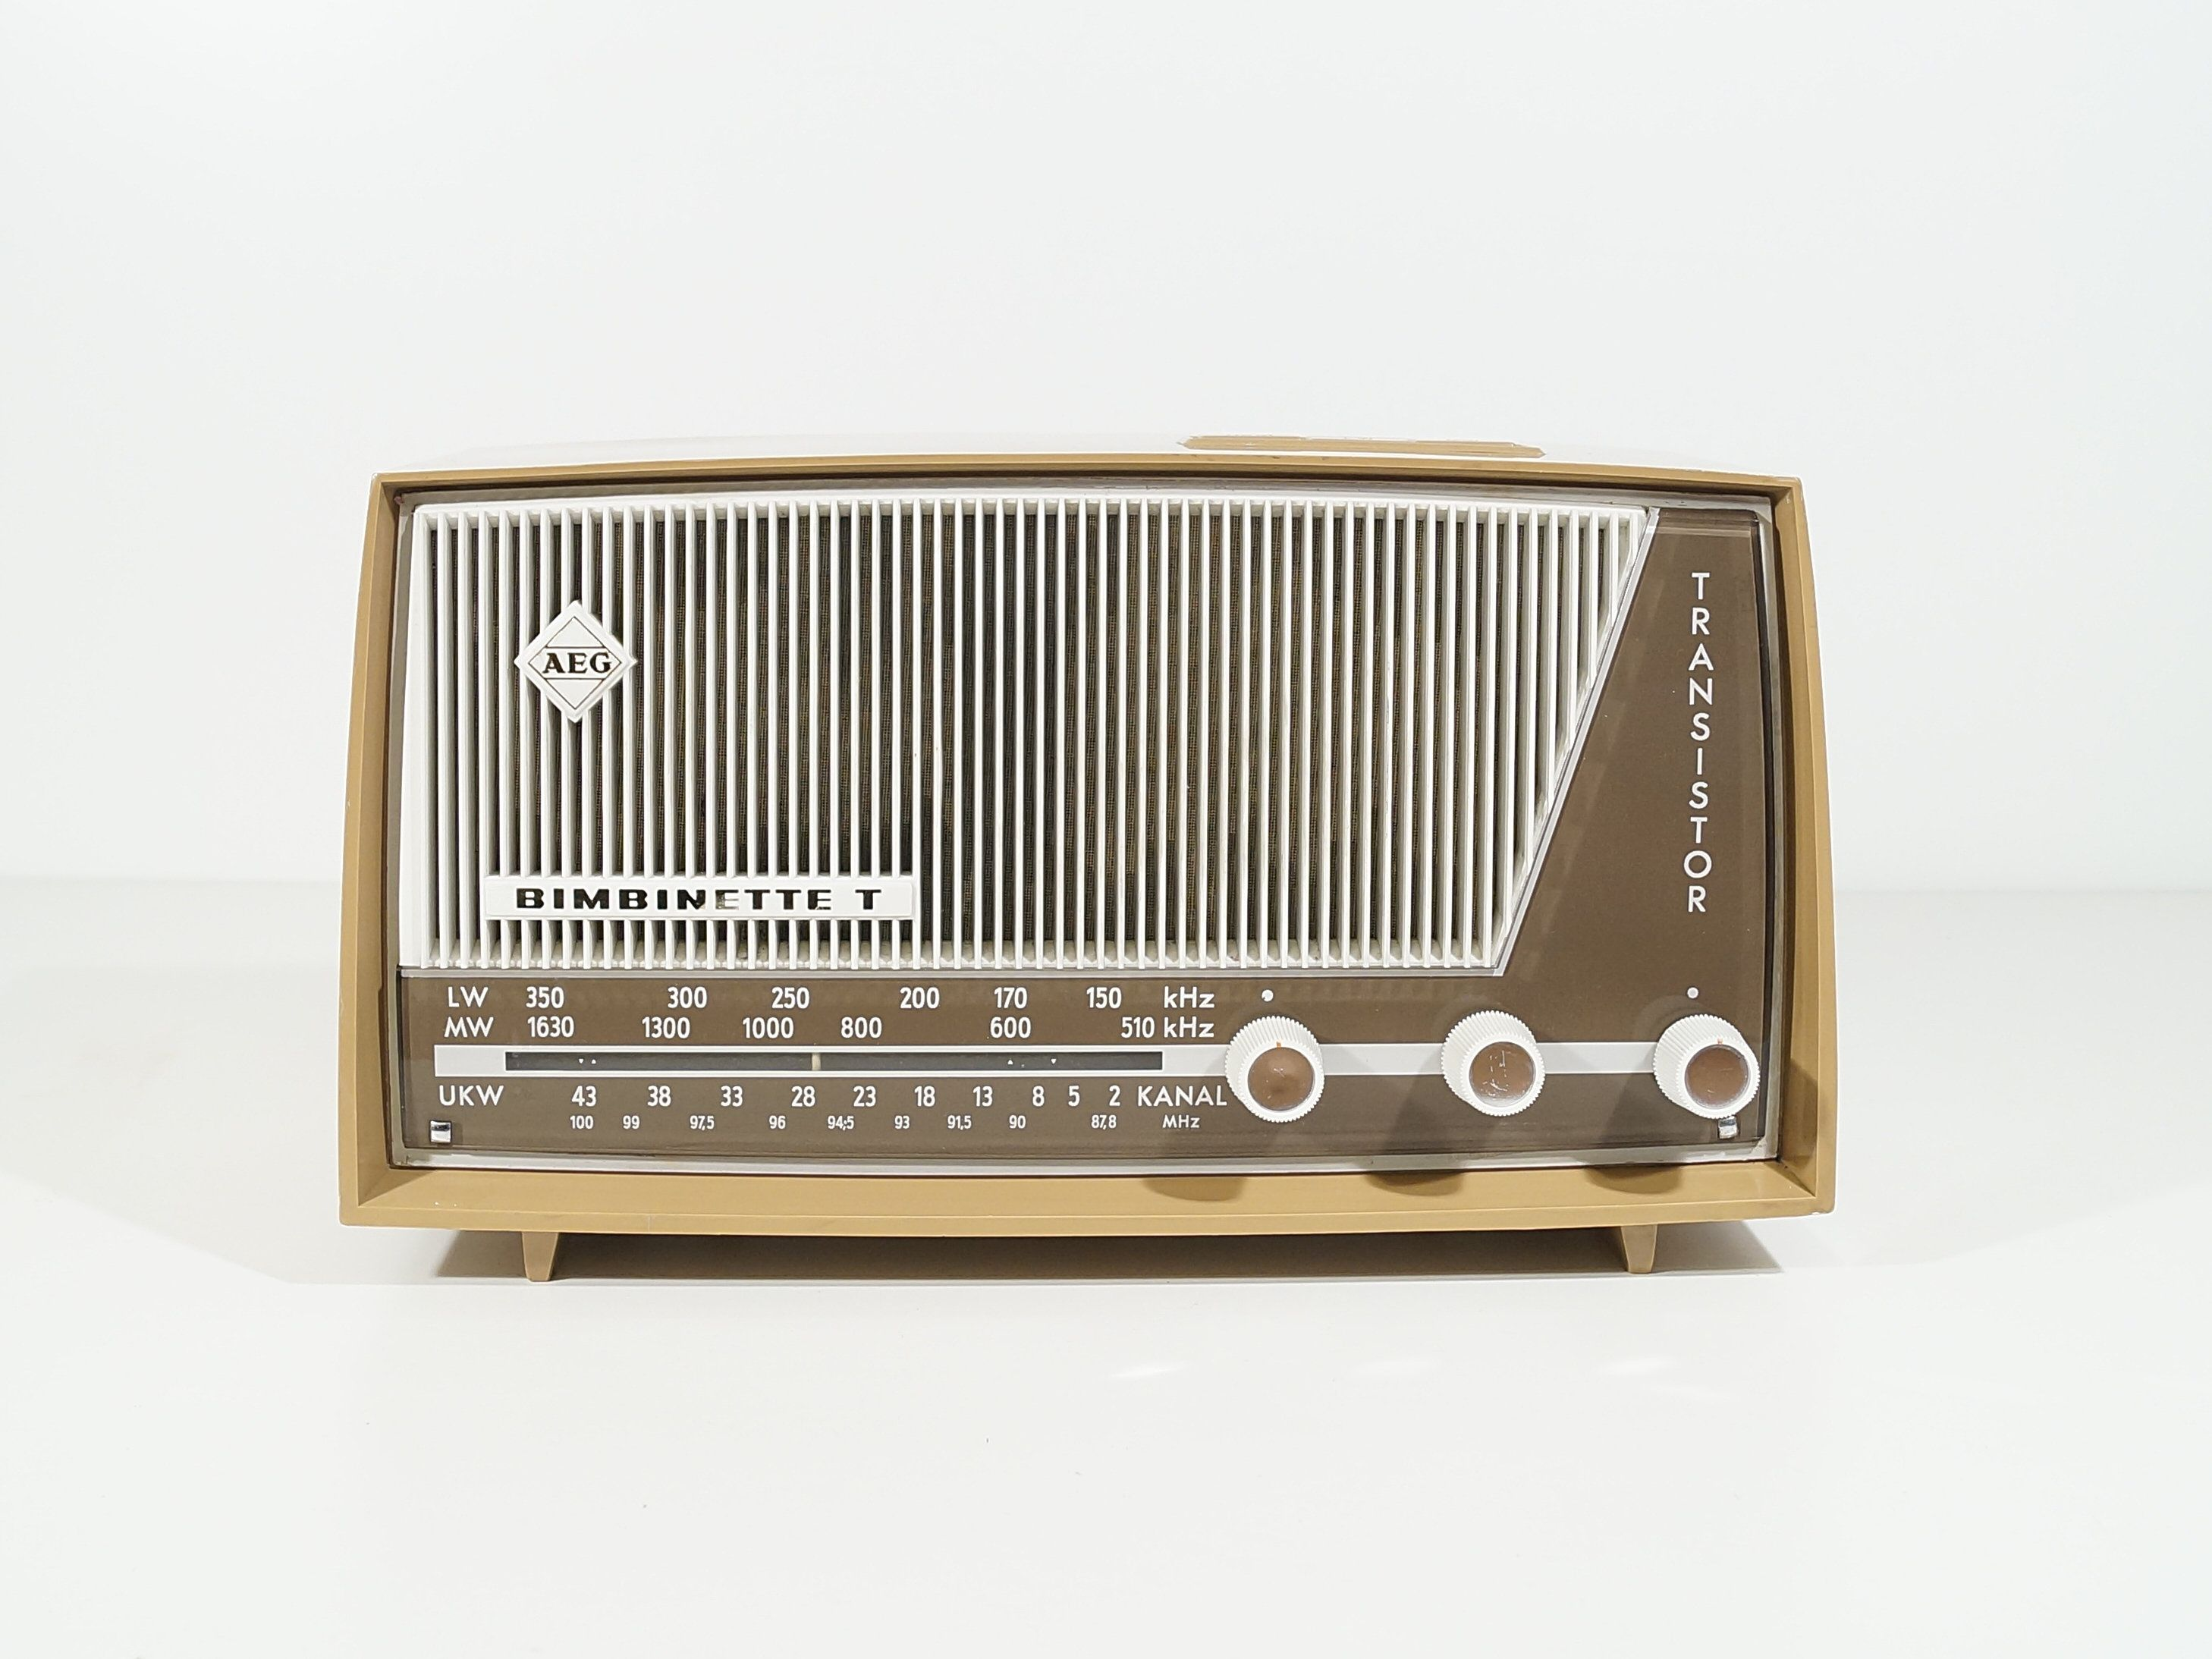 Transistor Radio Aeg Bimbinette T W Germany 1962 Vintage